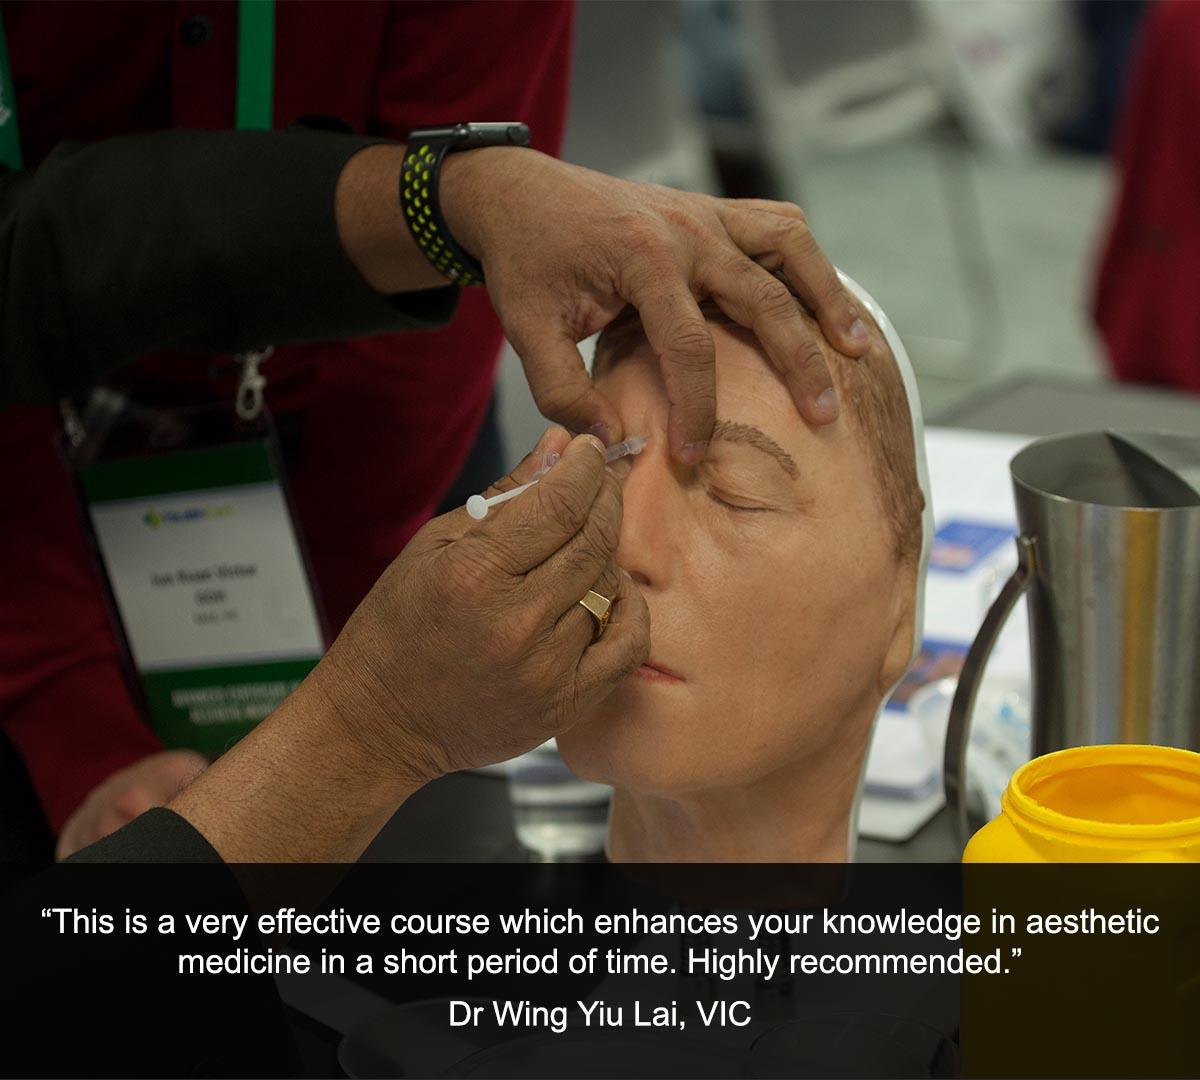 Advanced Certificate of Aesthetic Medicine